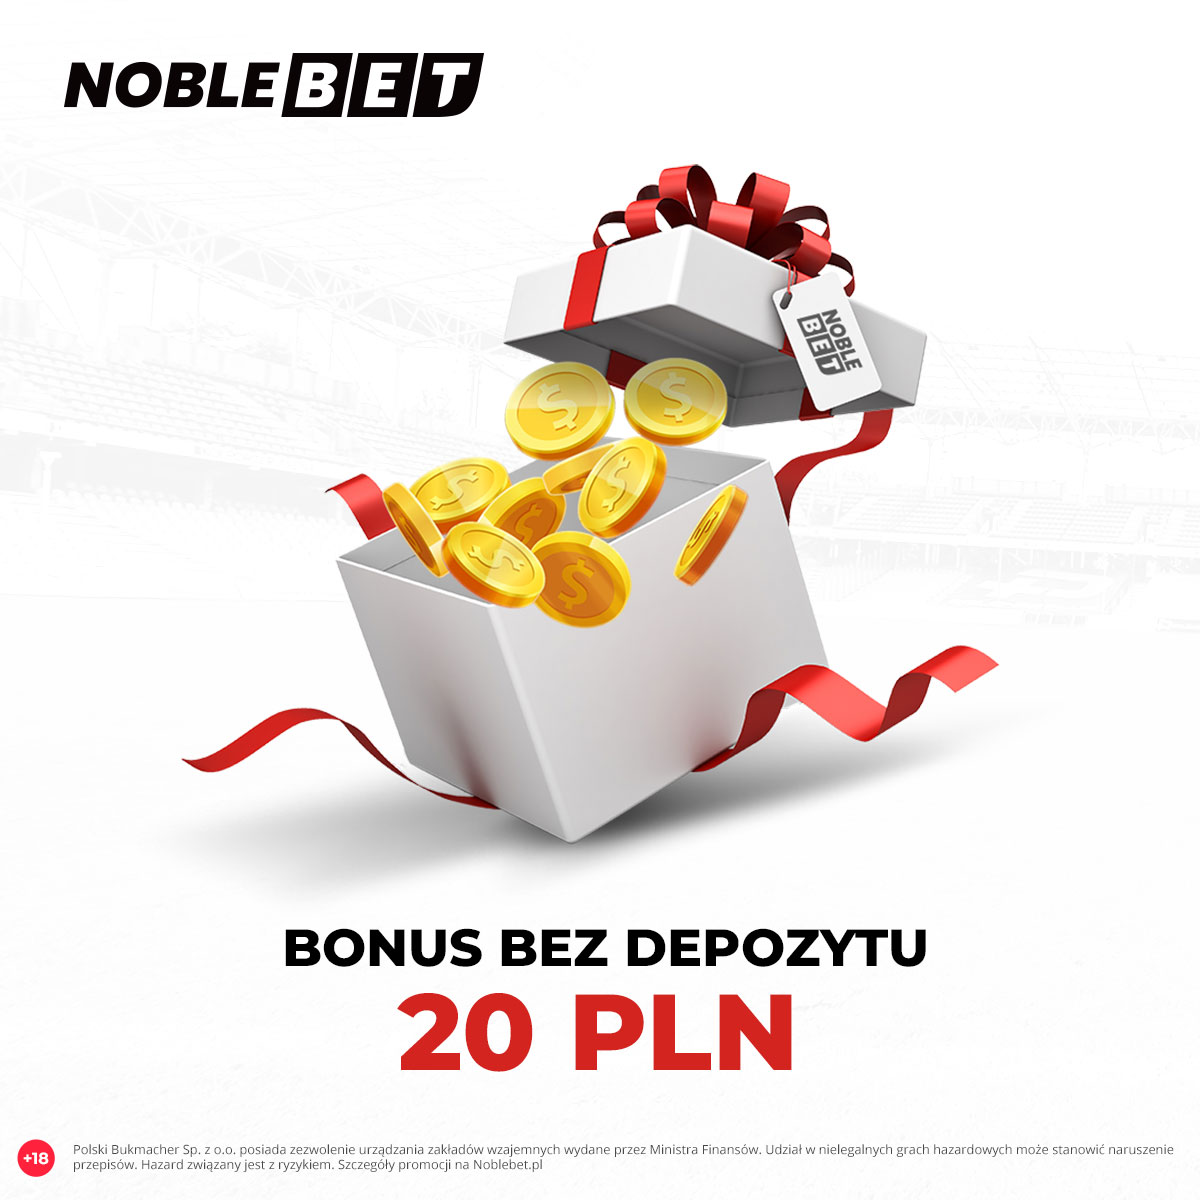 Noblebet – 20 zł bonus bez depozytu!